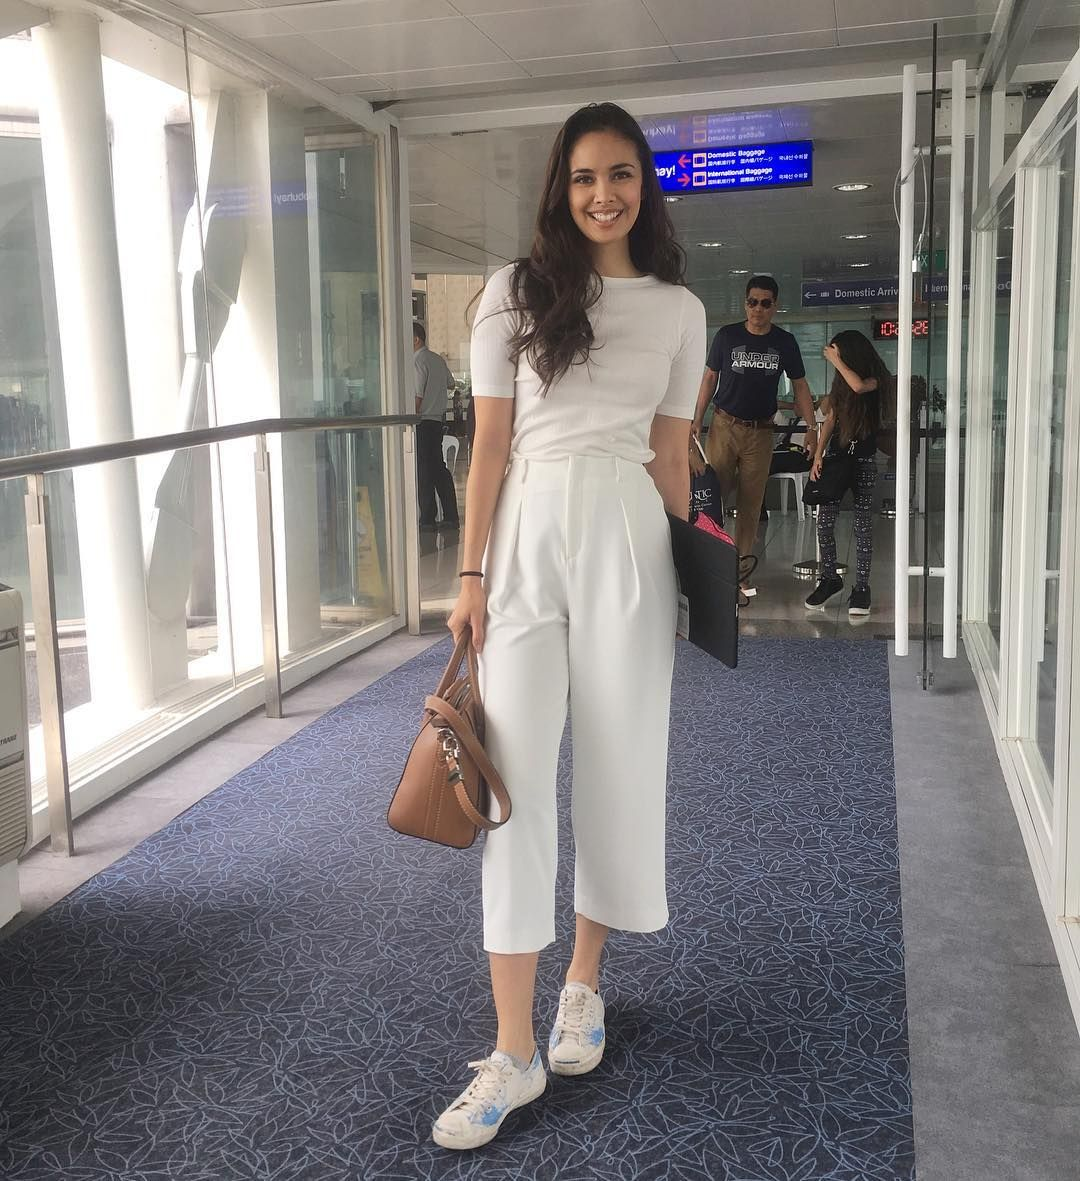 prada shoes instagram philippines celebrities news